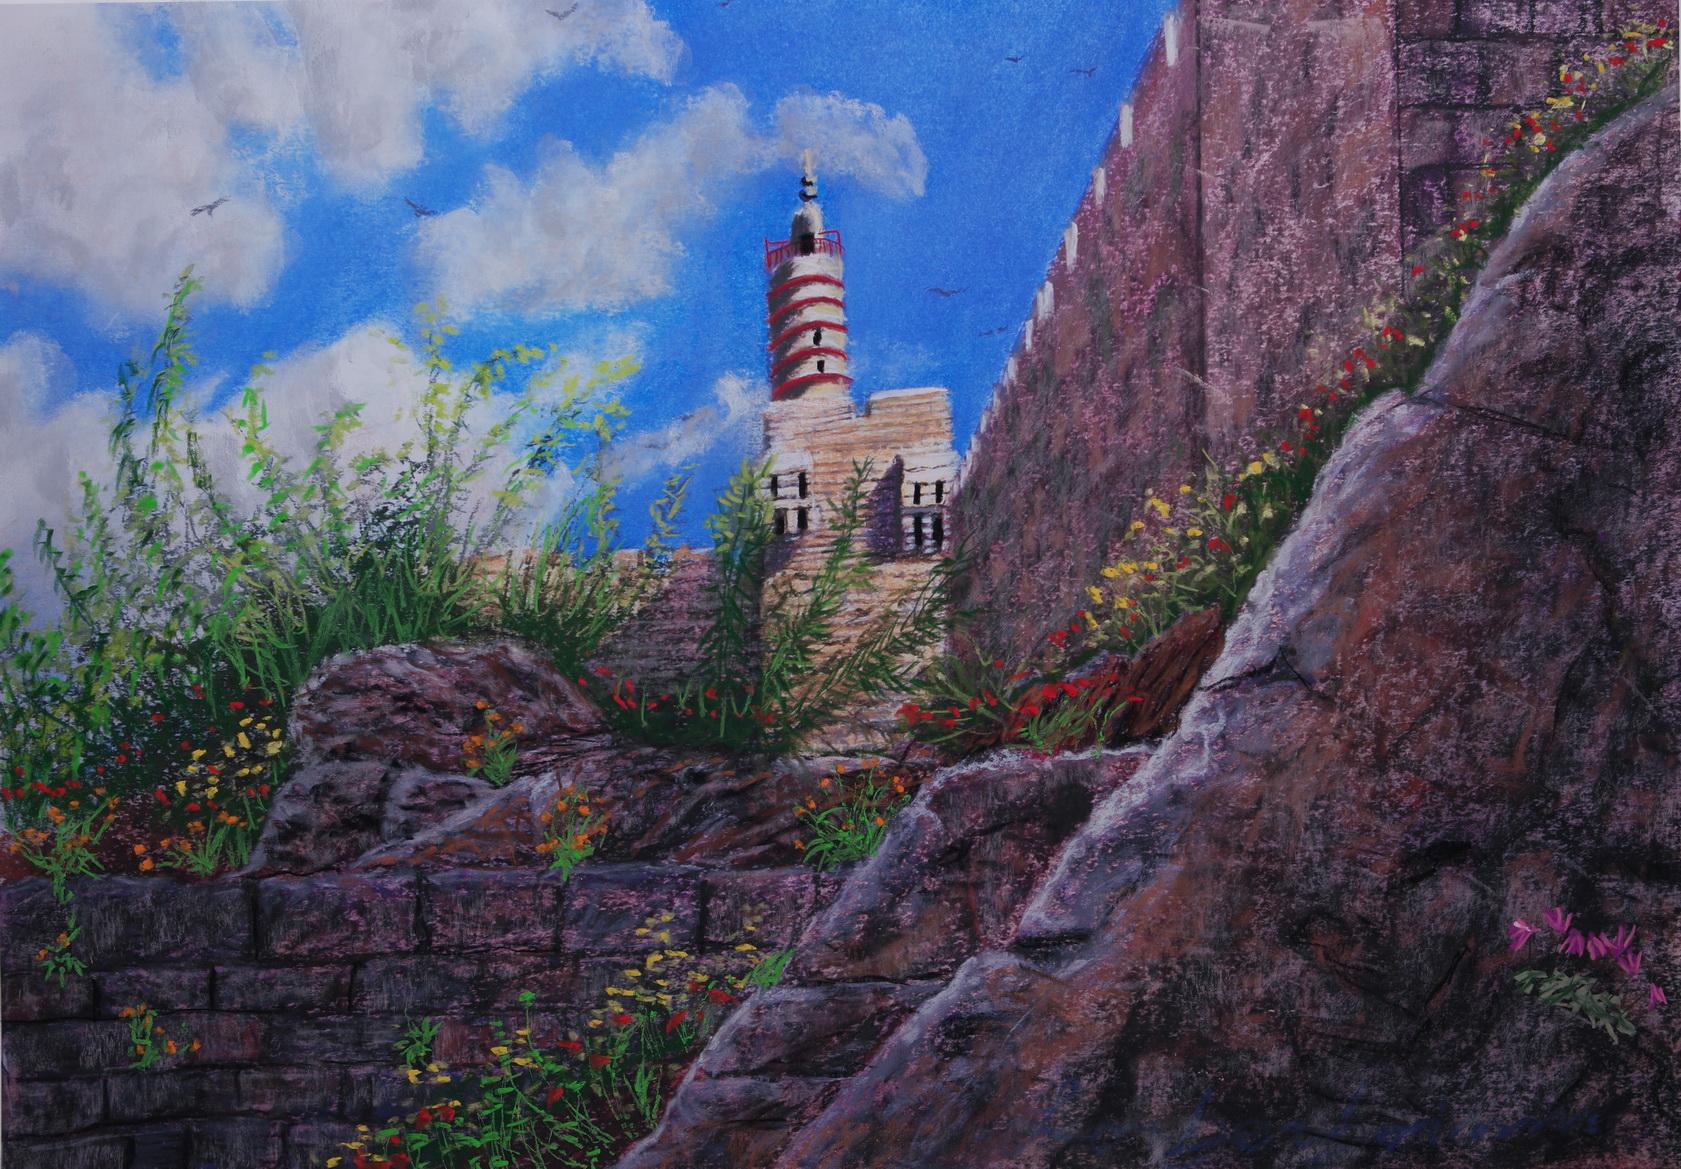 Tower of David, Yerushlaim, Israel. 31 May.   מגדל דוד, ירושלים, ישראל